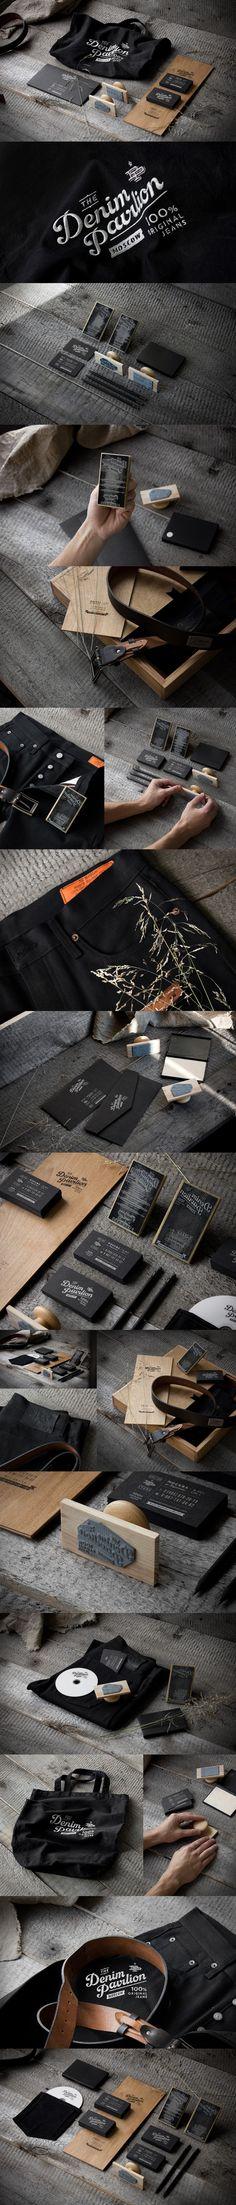 The Denim Pavilion packaging branding marketing PD